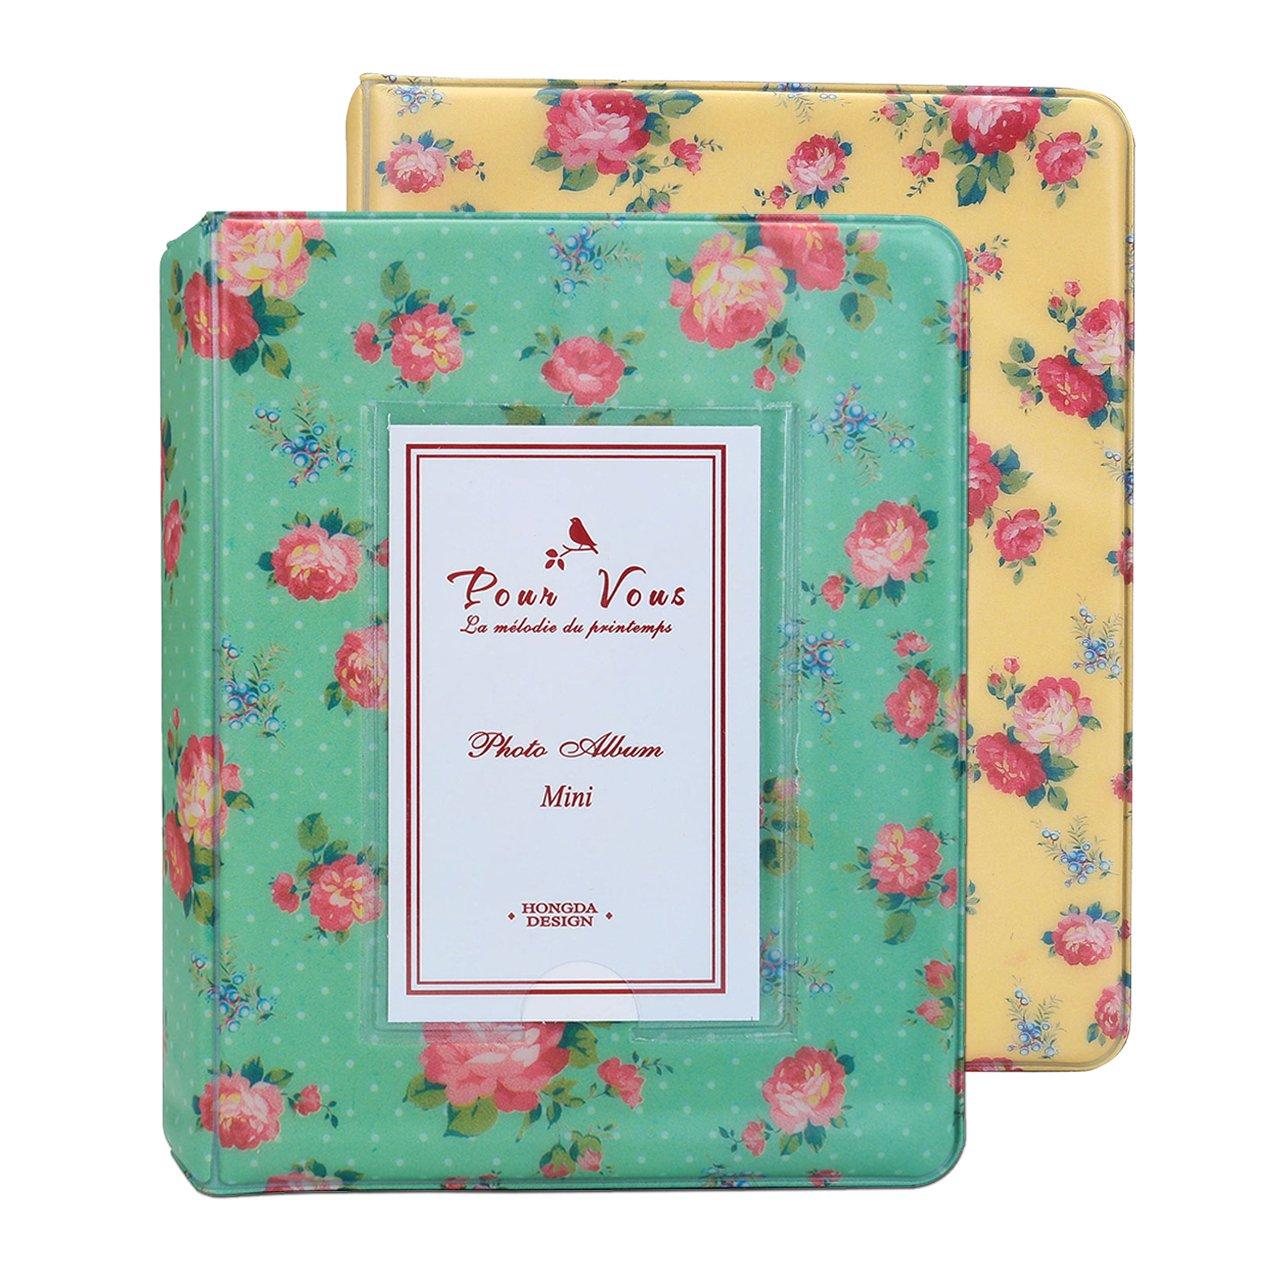 WarmHut Instax Album Set, Bundles Set of 2 Vintage Flower Floral Mini Photo Album, for Fuji Fujifilm Instax Mini 8 90 Polaroid, 3-inch Business Credit Name Card Holder (Green/Yellow)